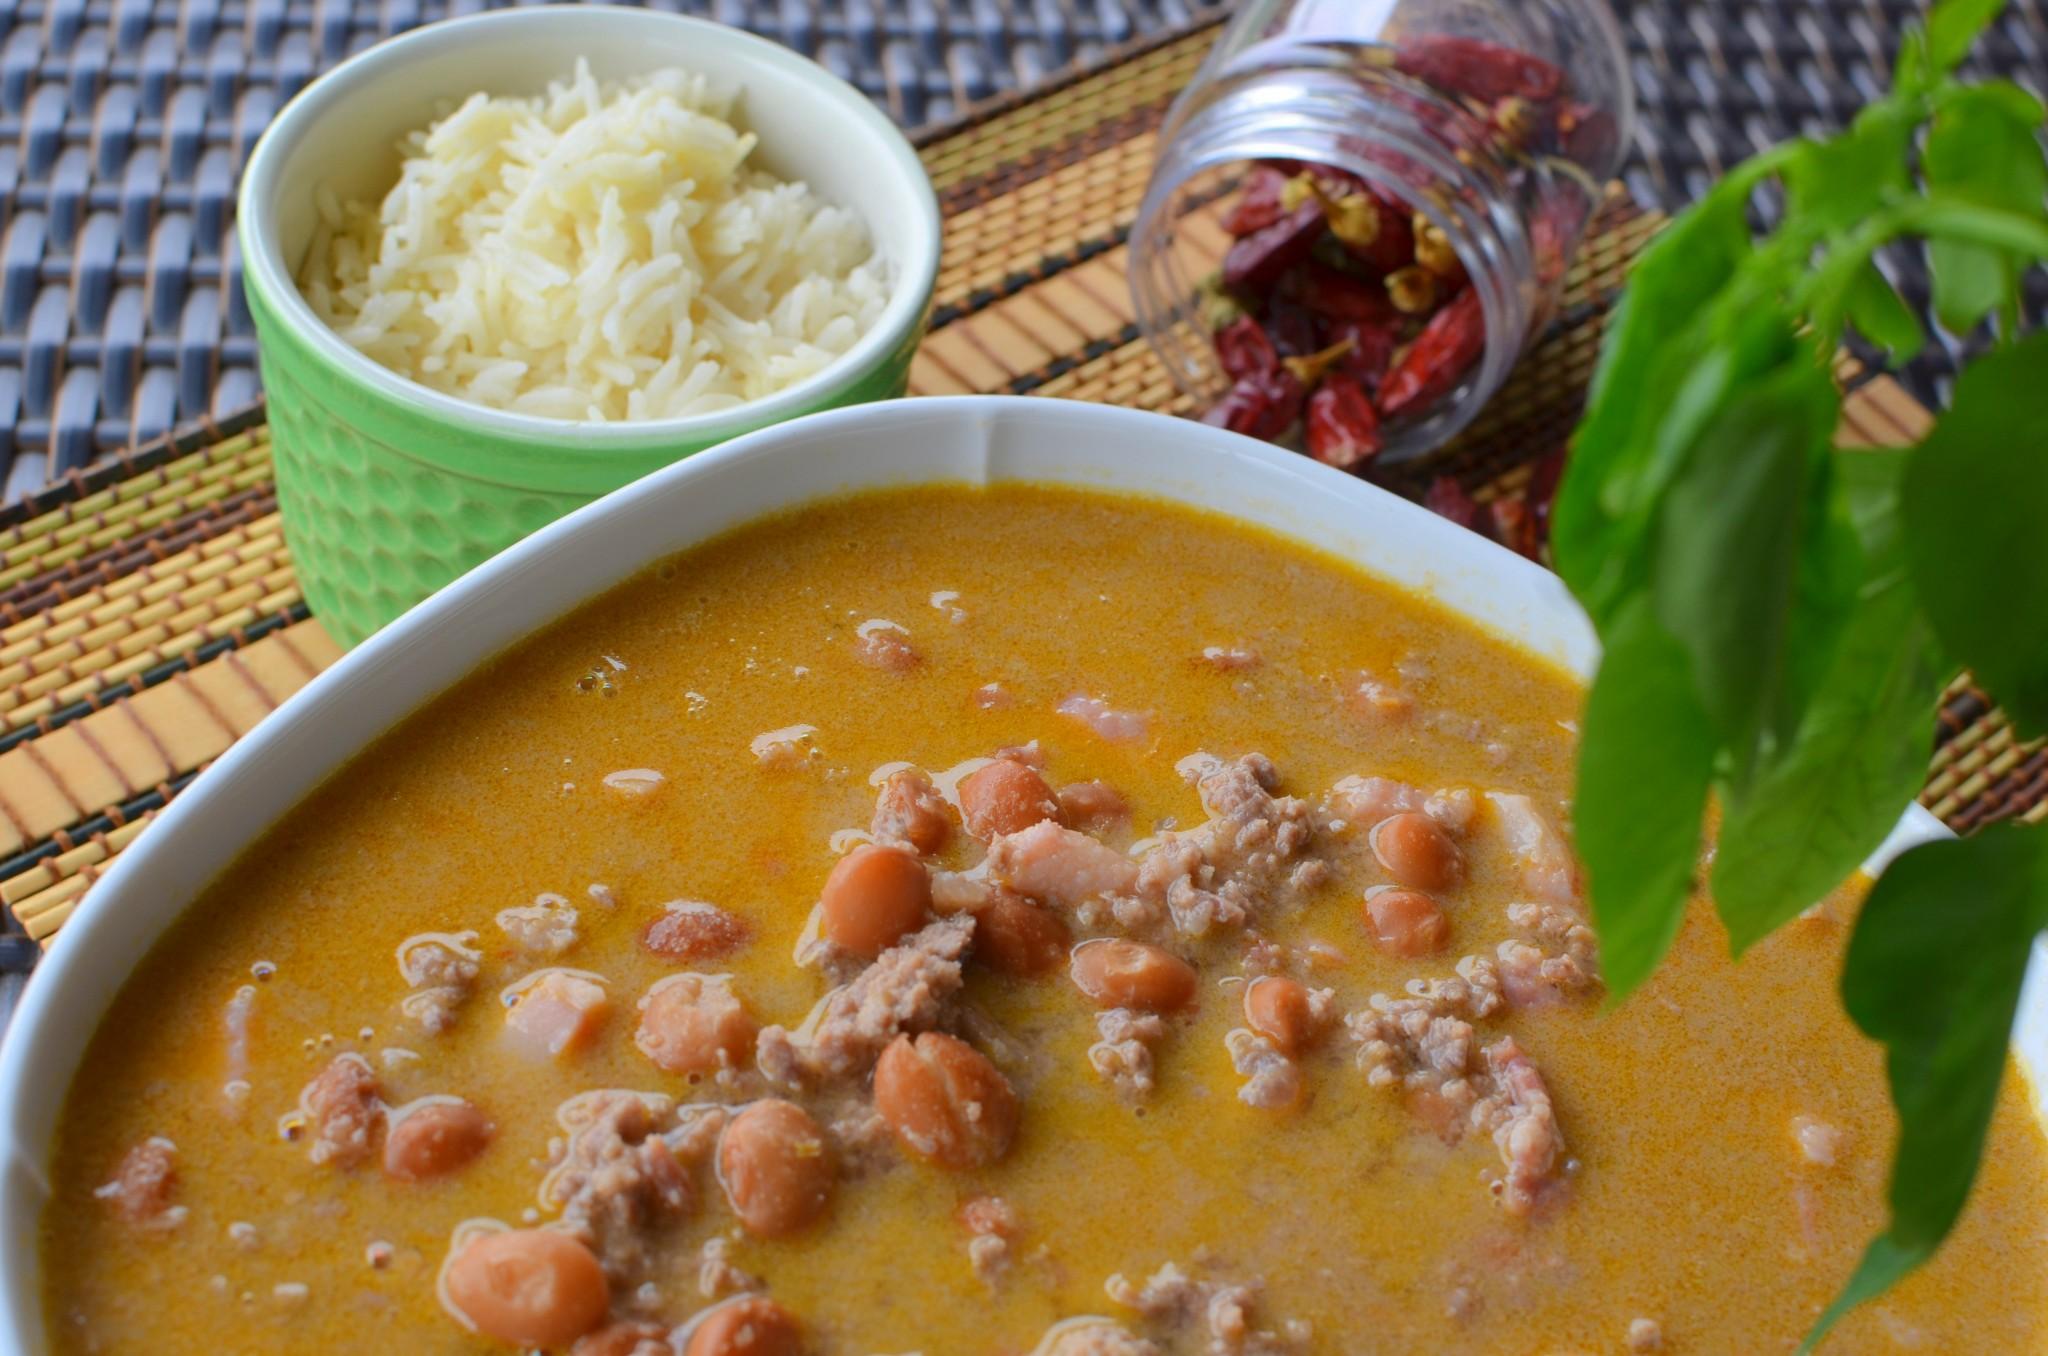 Coconut milk chilli beans